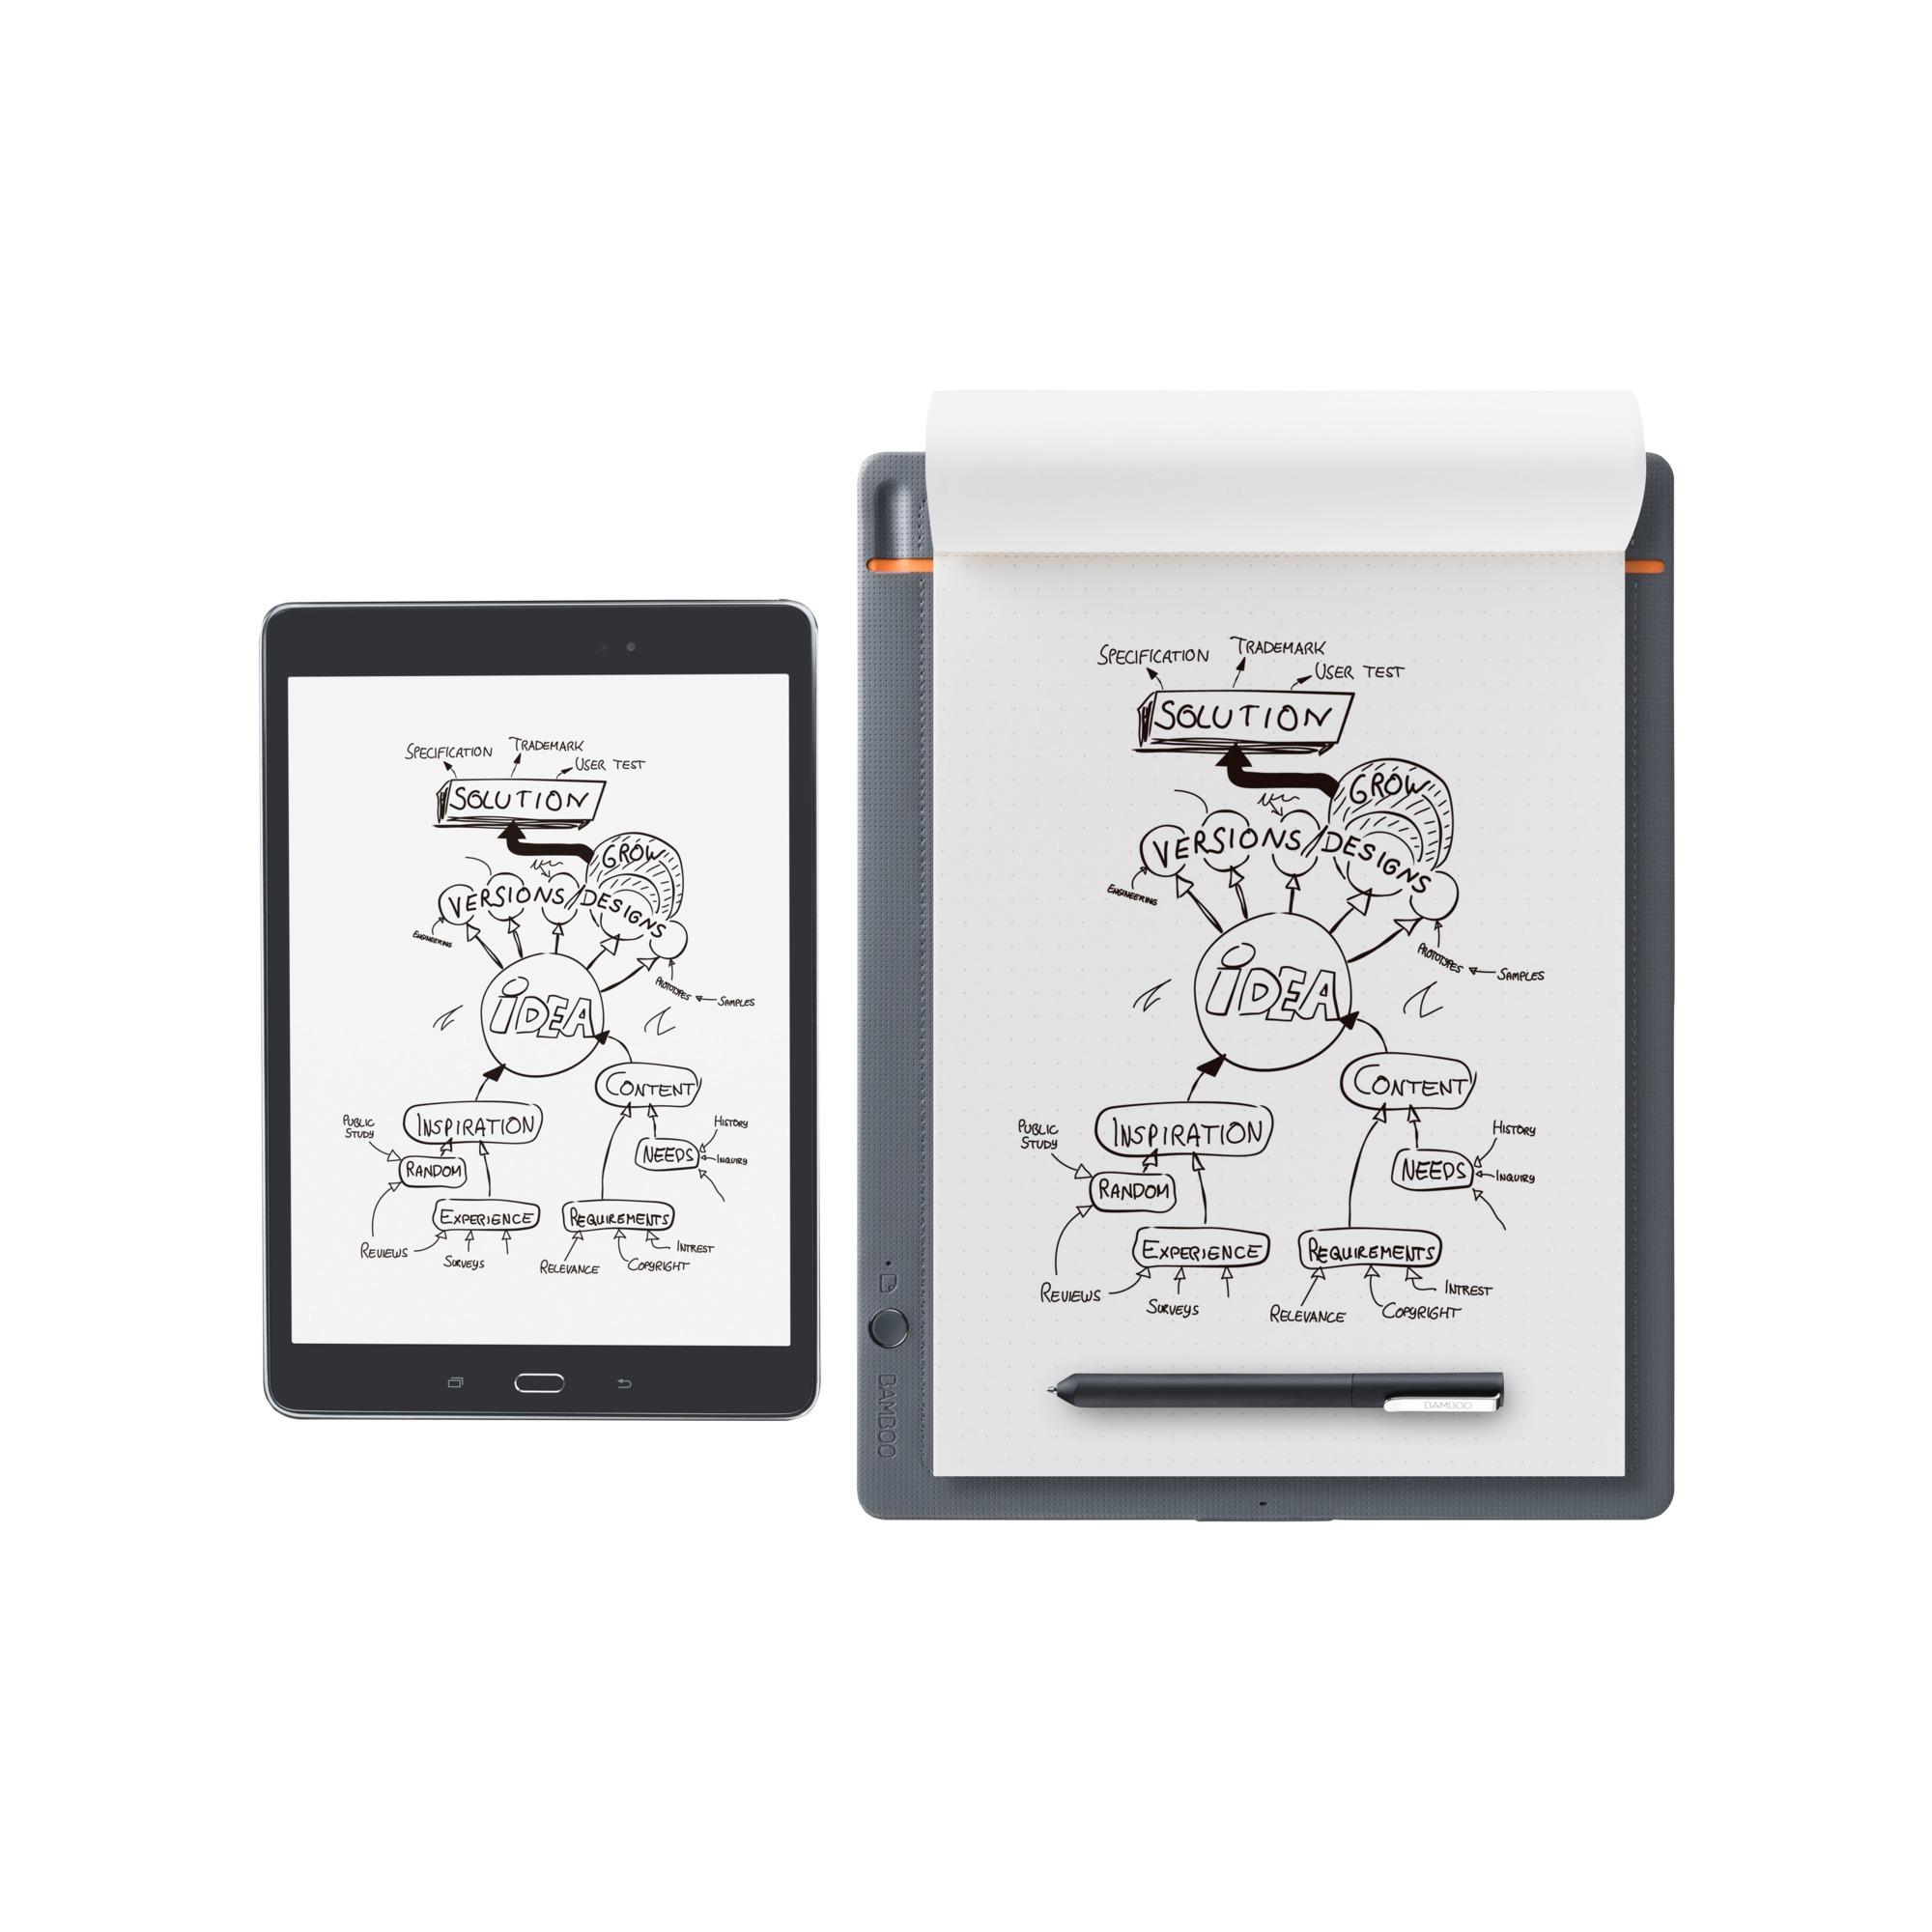 Bamboo CDS-810S tableta digitalizadora Gris, Naranja, Tableta gráfica